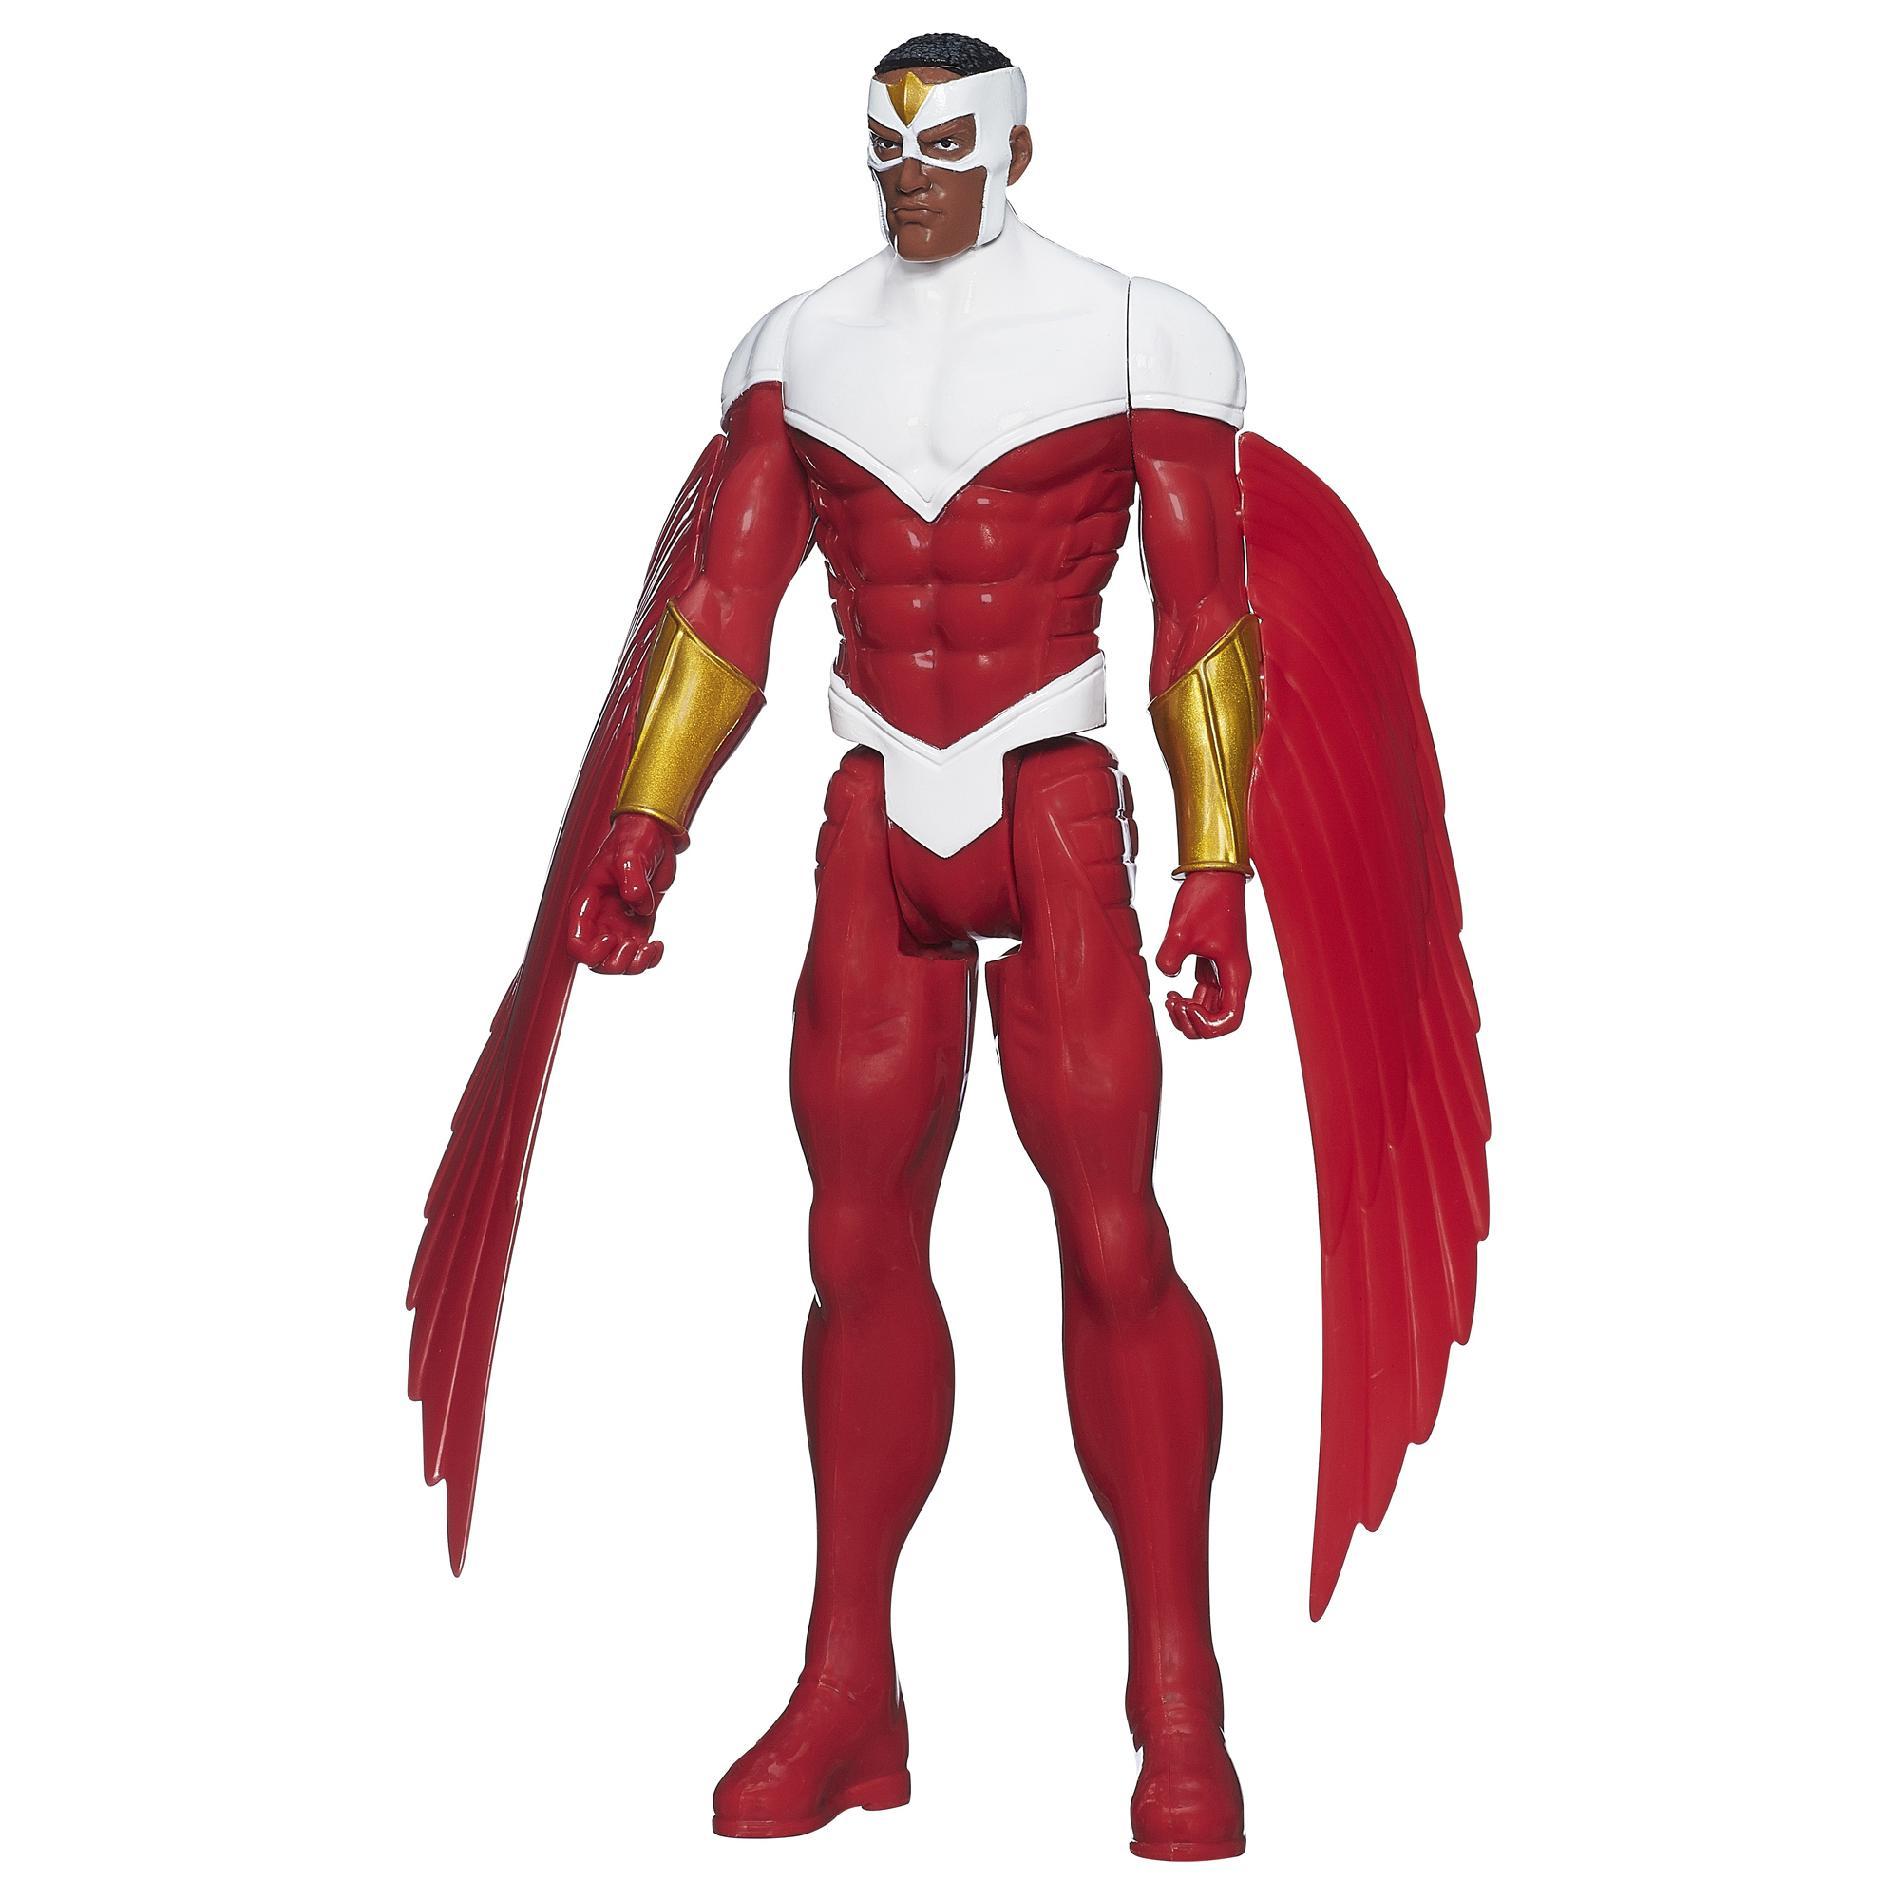 MARVEL TITAN HERO SERIES MARVEL'S FALCOM